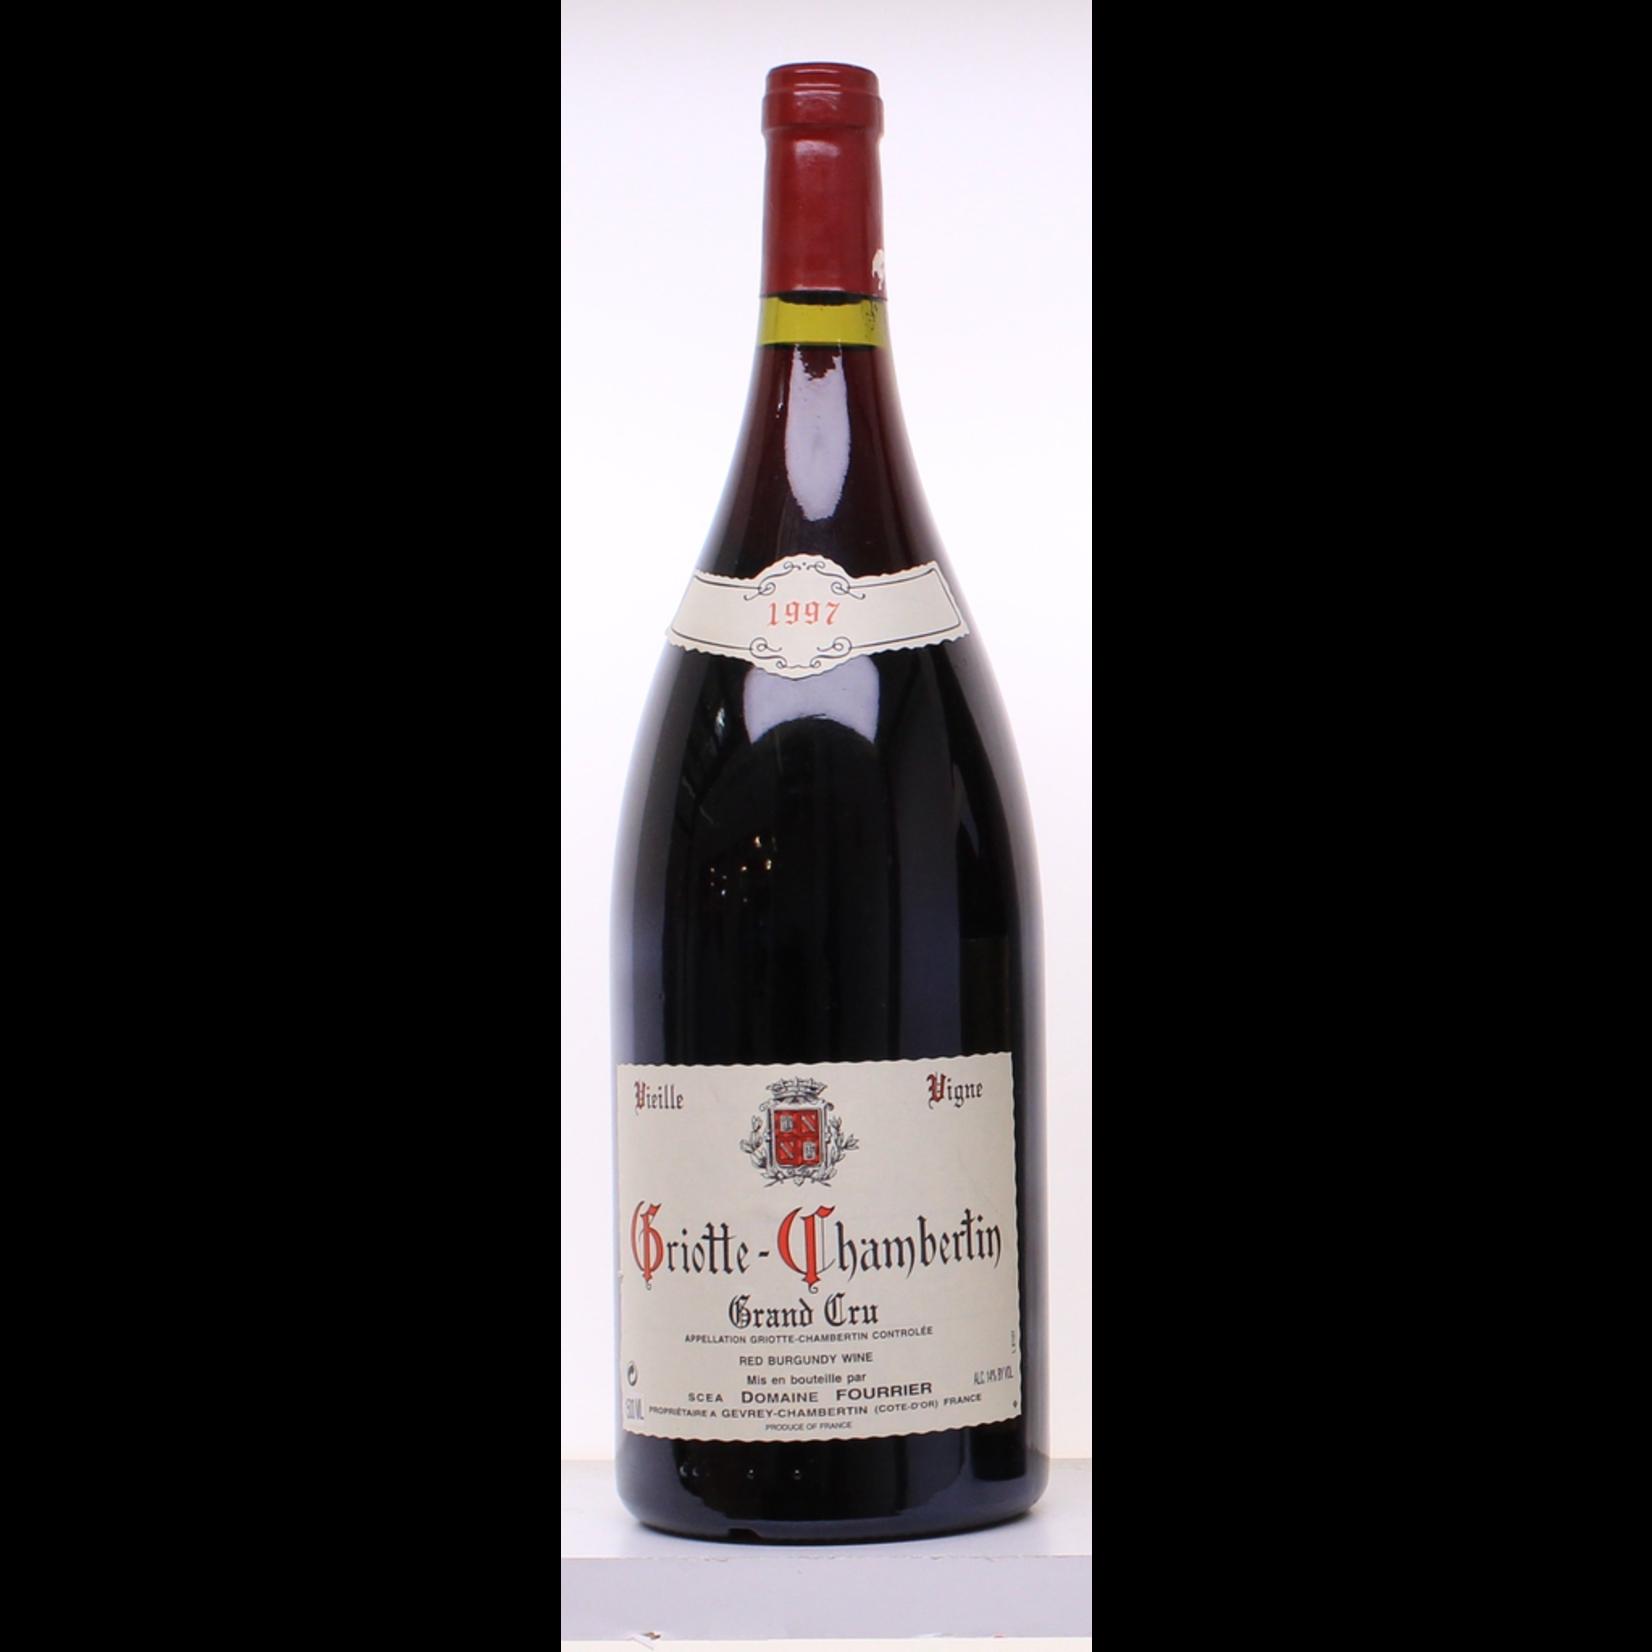 Wine Domaine Fourrier Griotte Chambertin Grand Cru 1997 1.5L